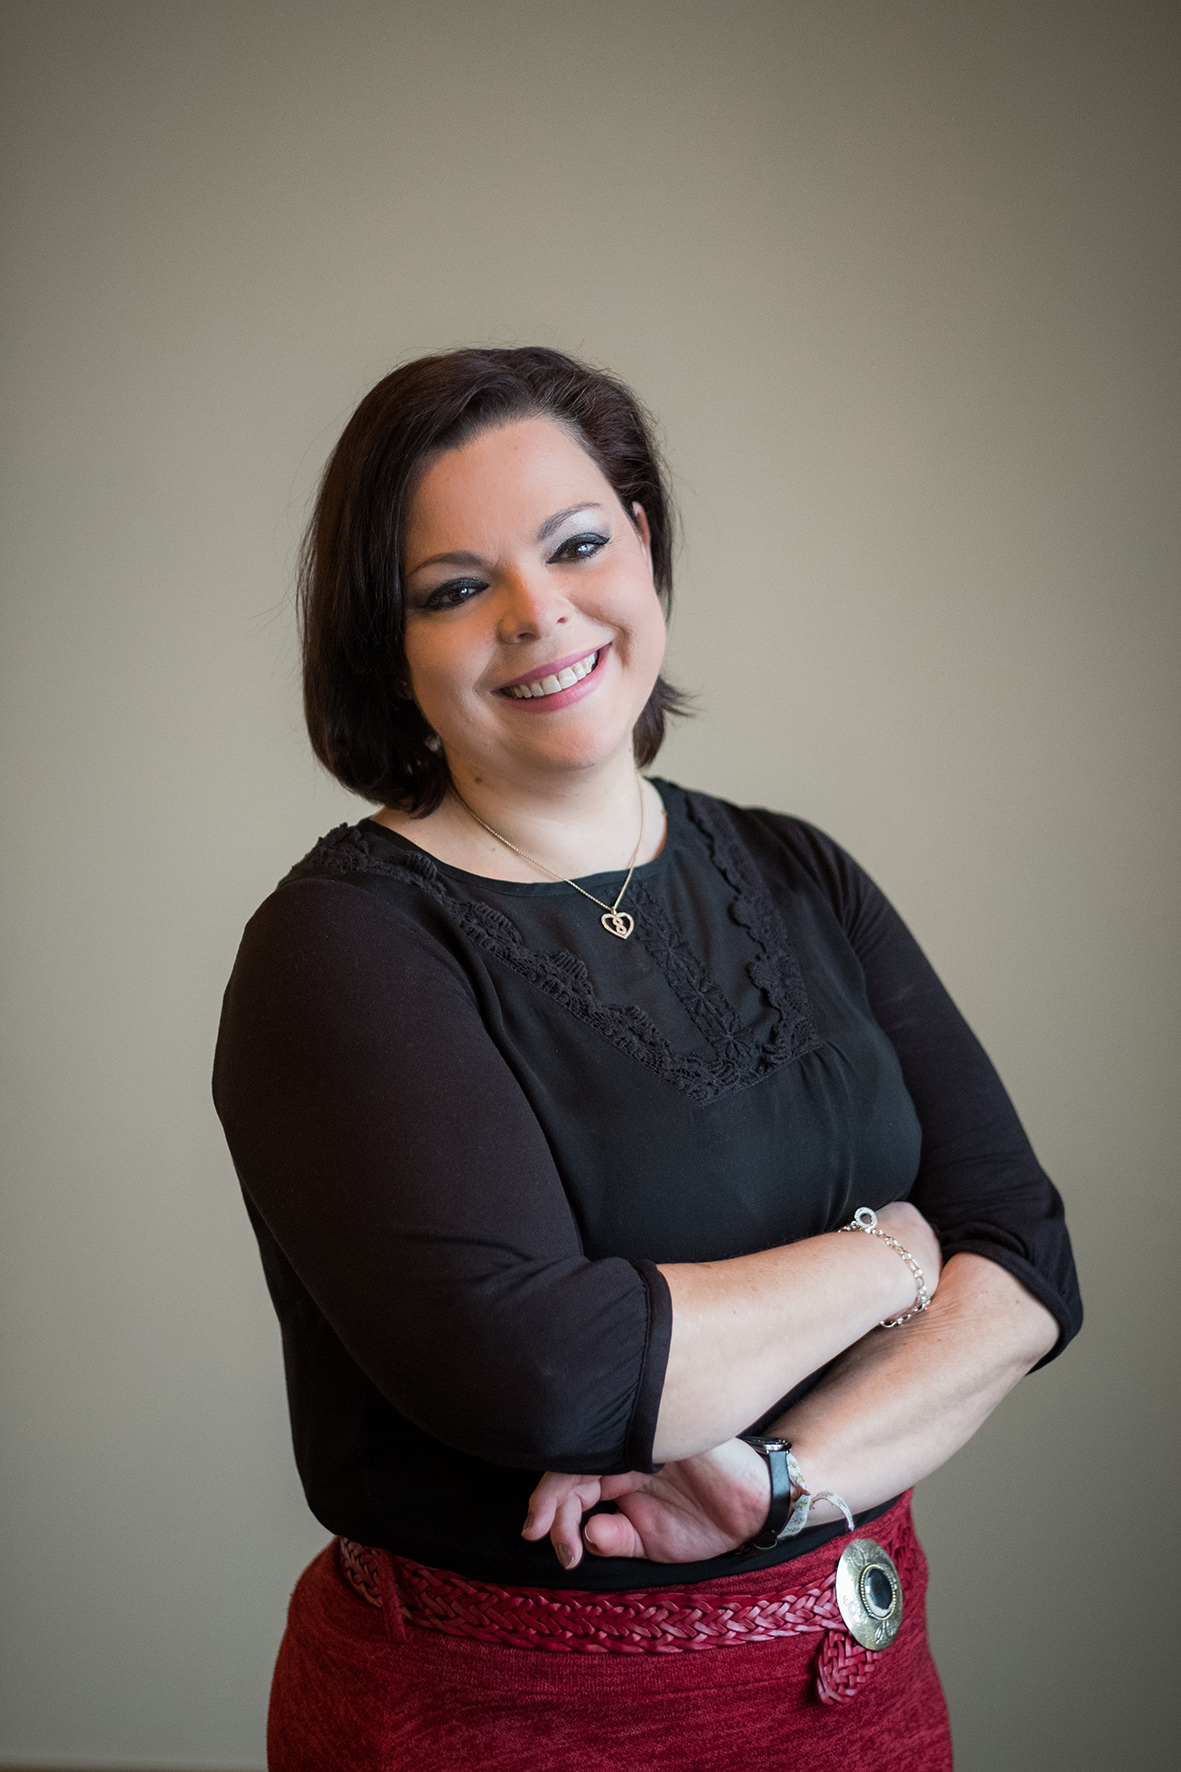 Dra. Angélica Urda